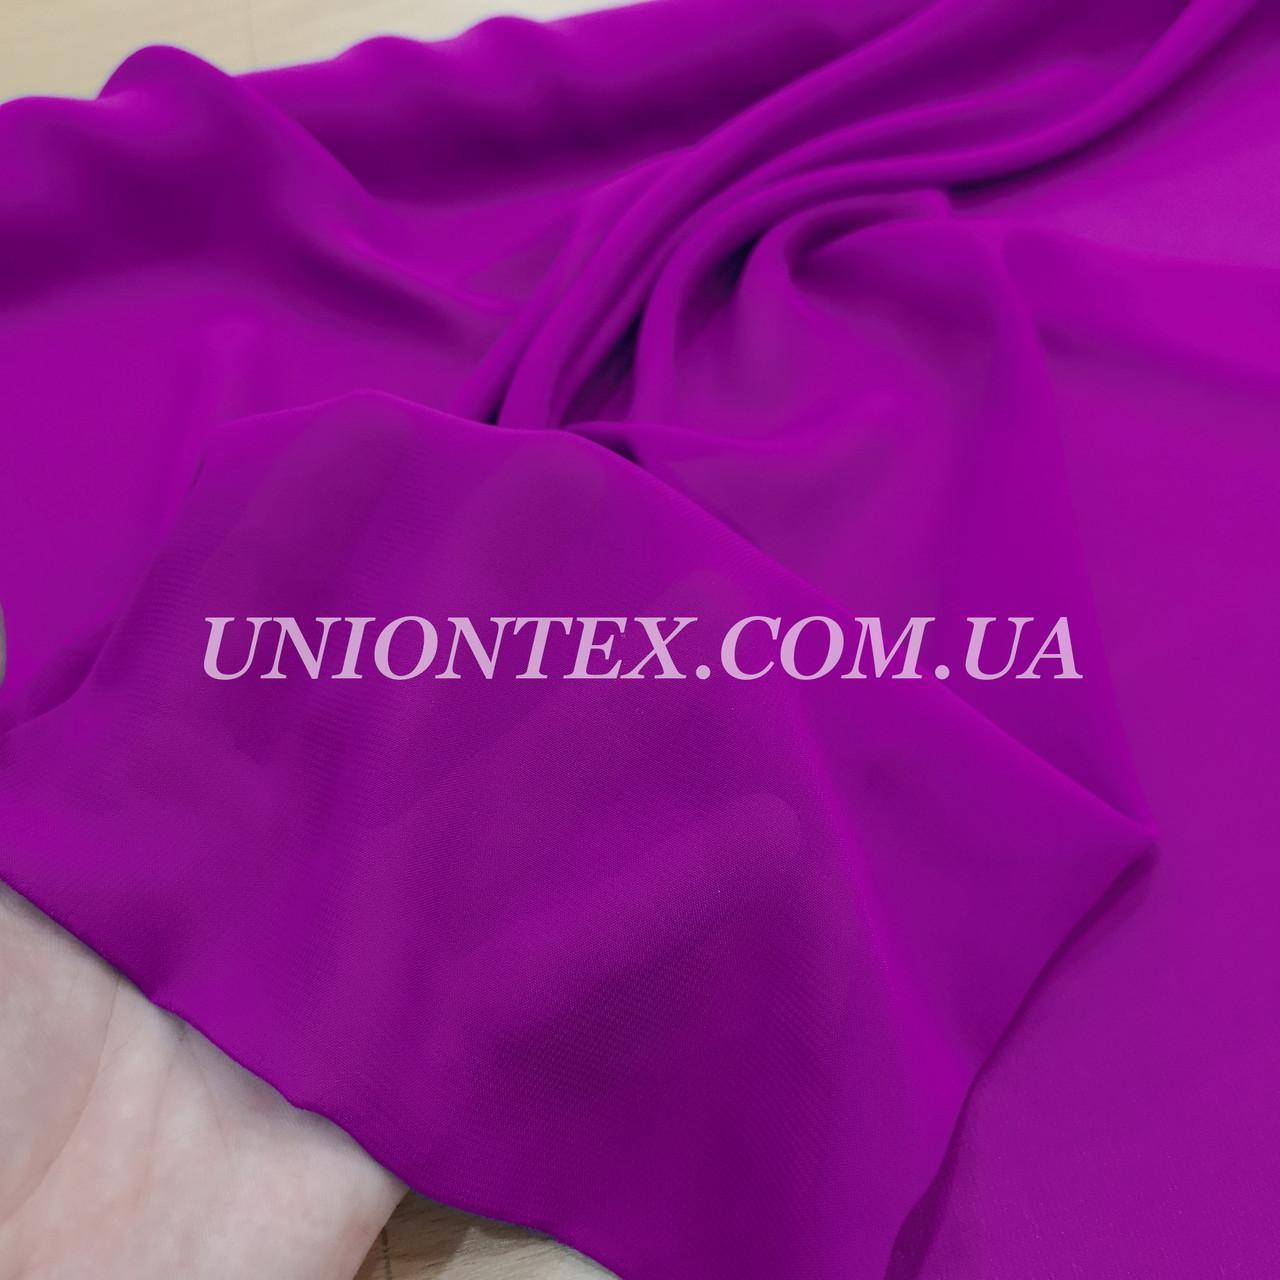 Ткань шифон фиолетовый